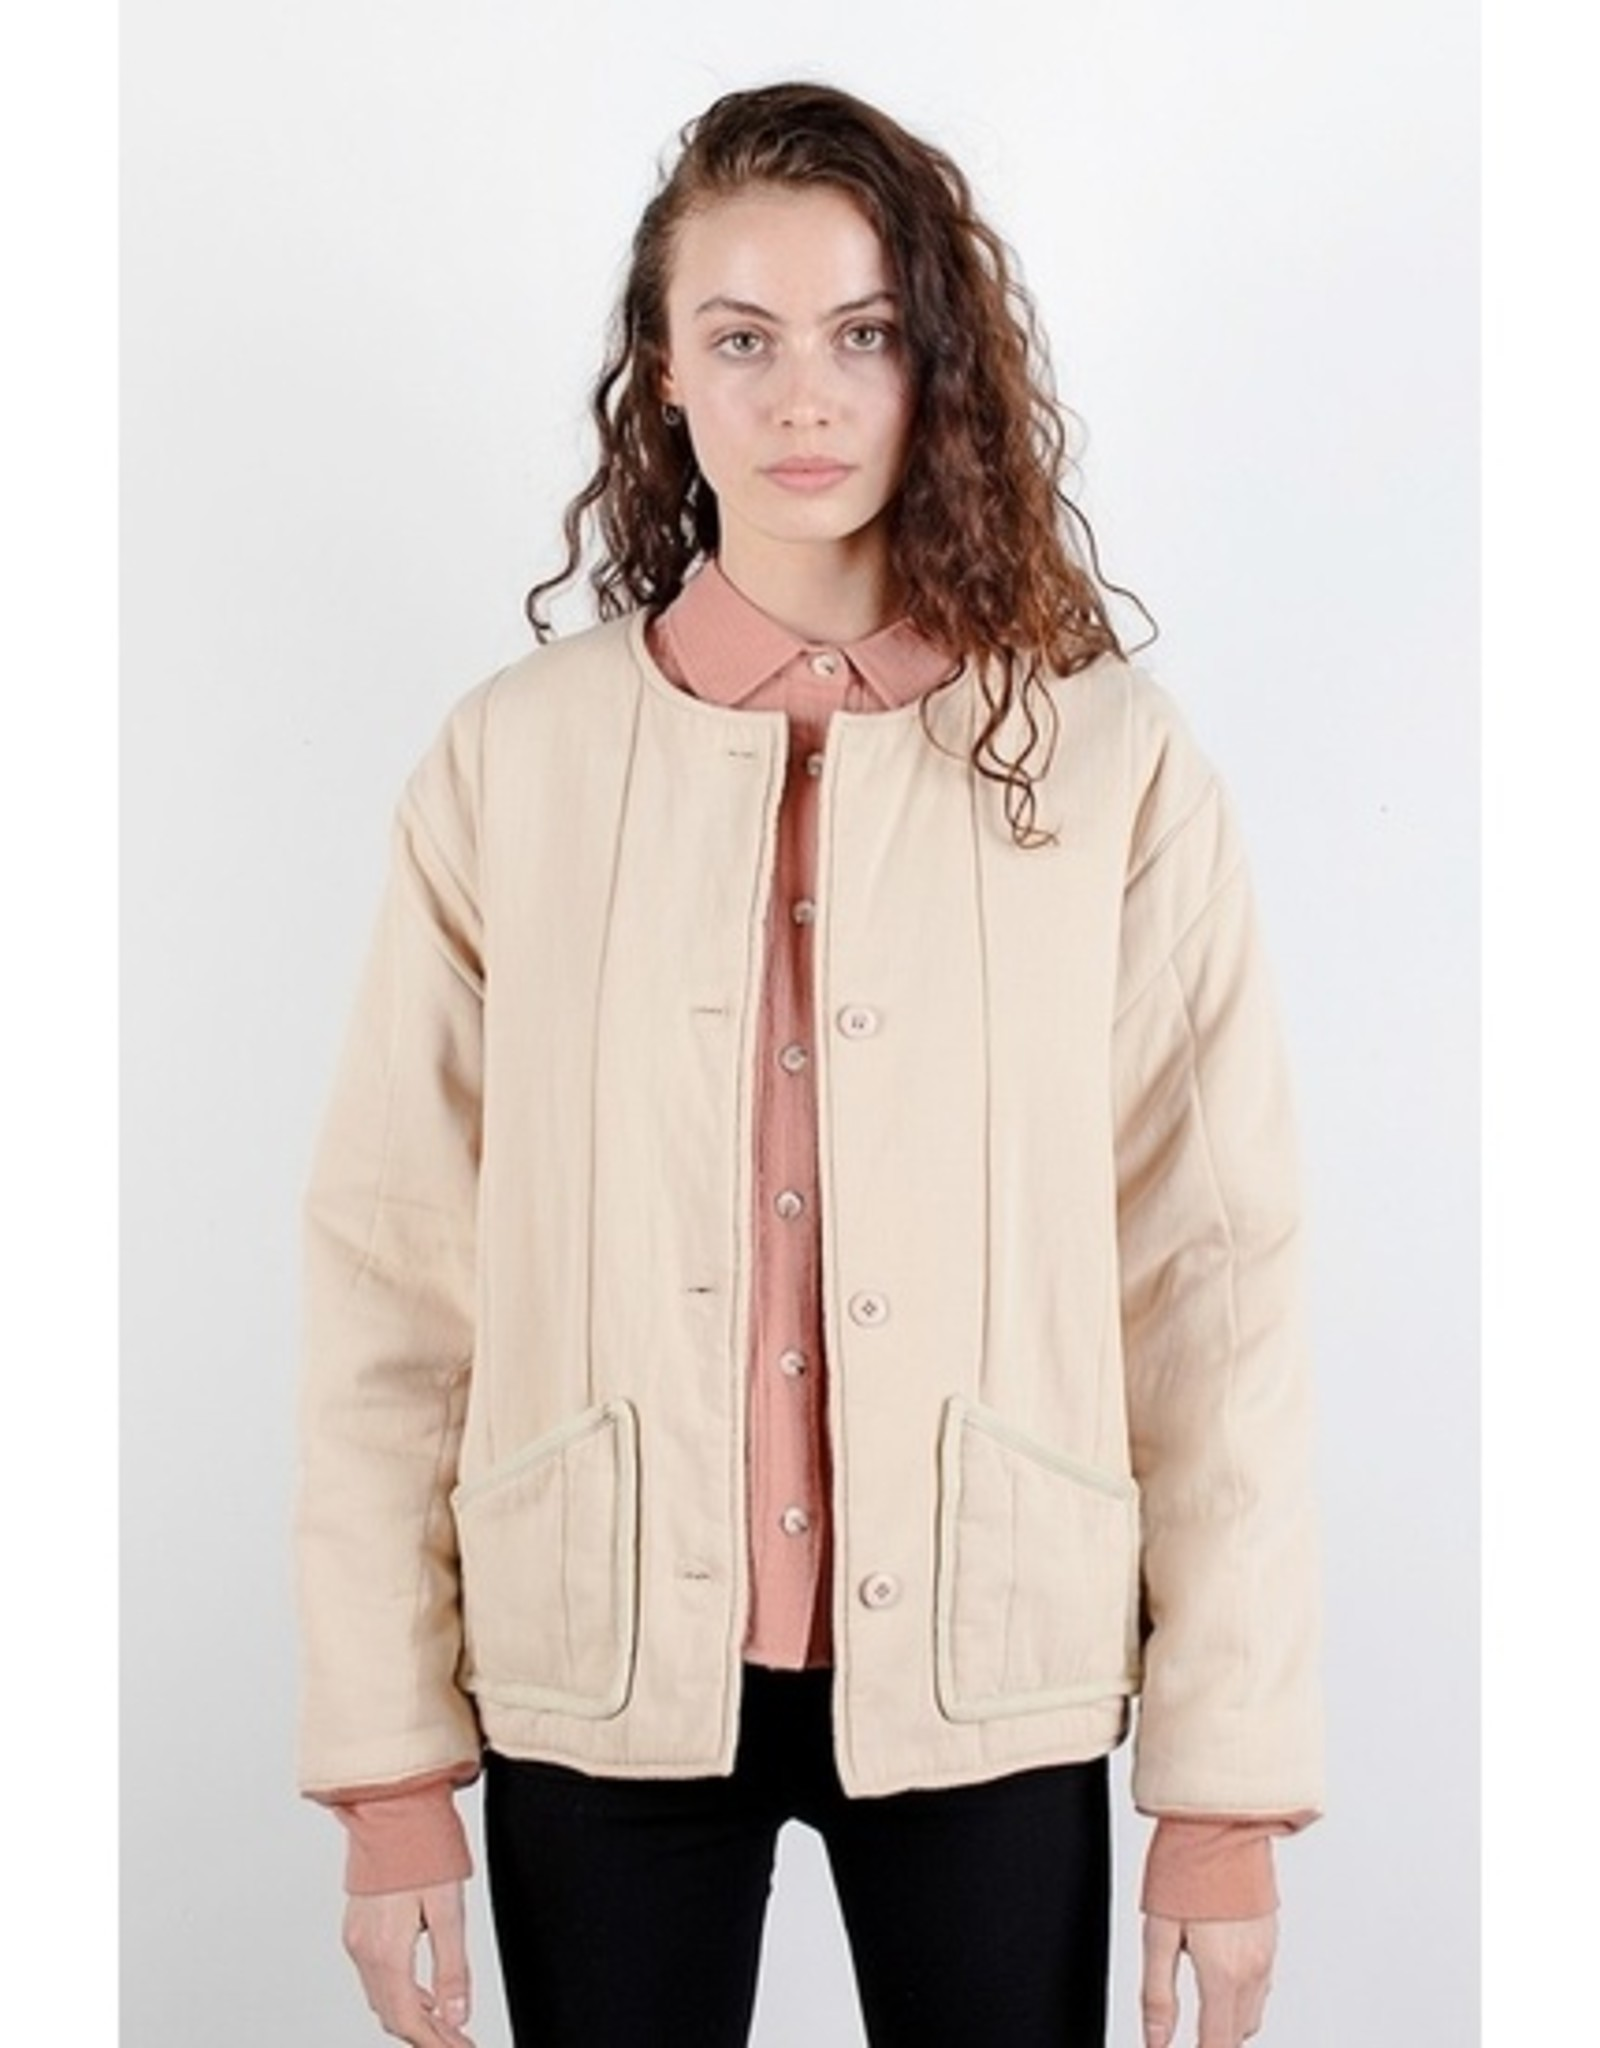 Mod Ref TR2374 The Shane Jacket